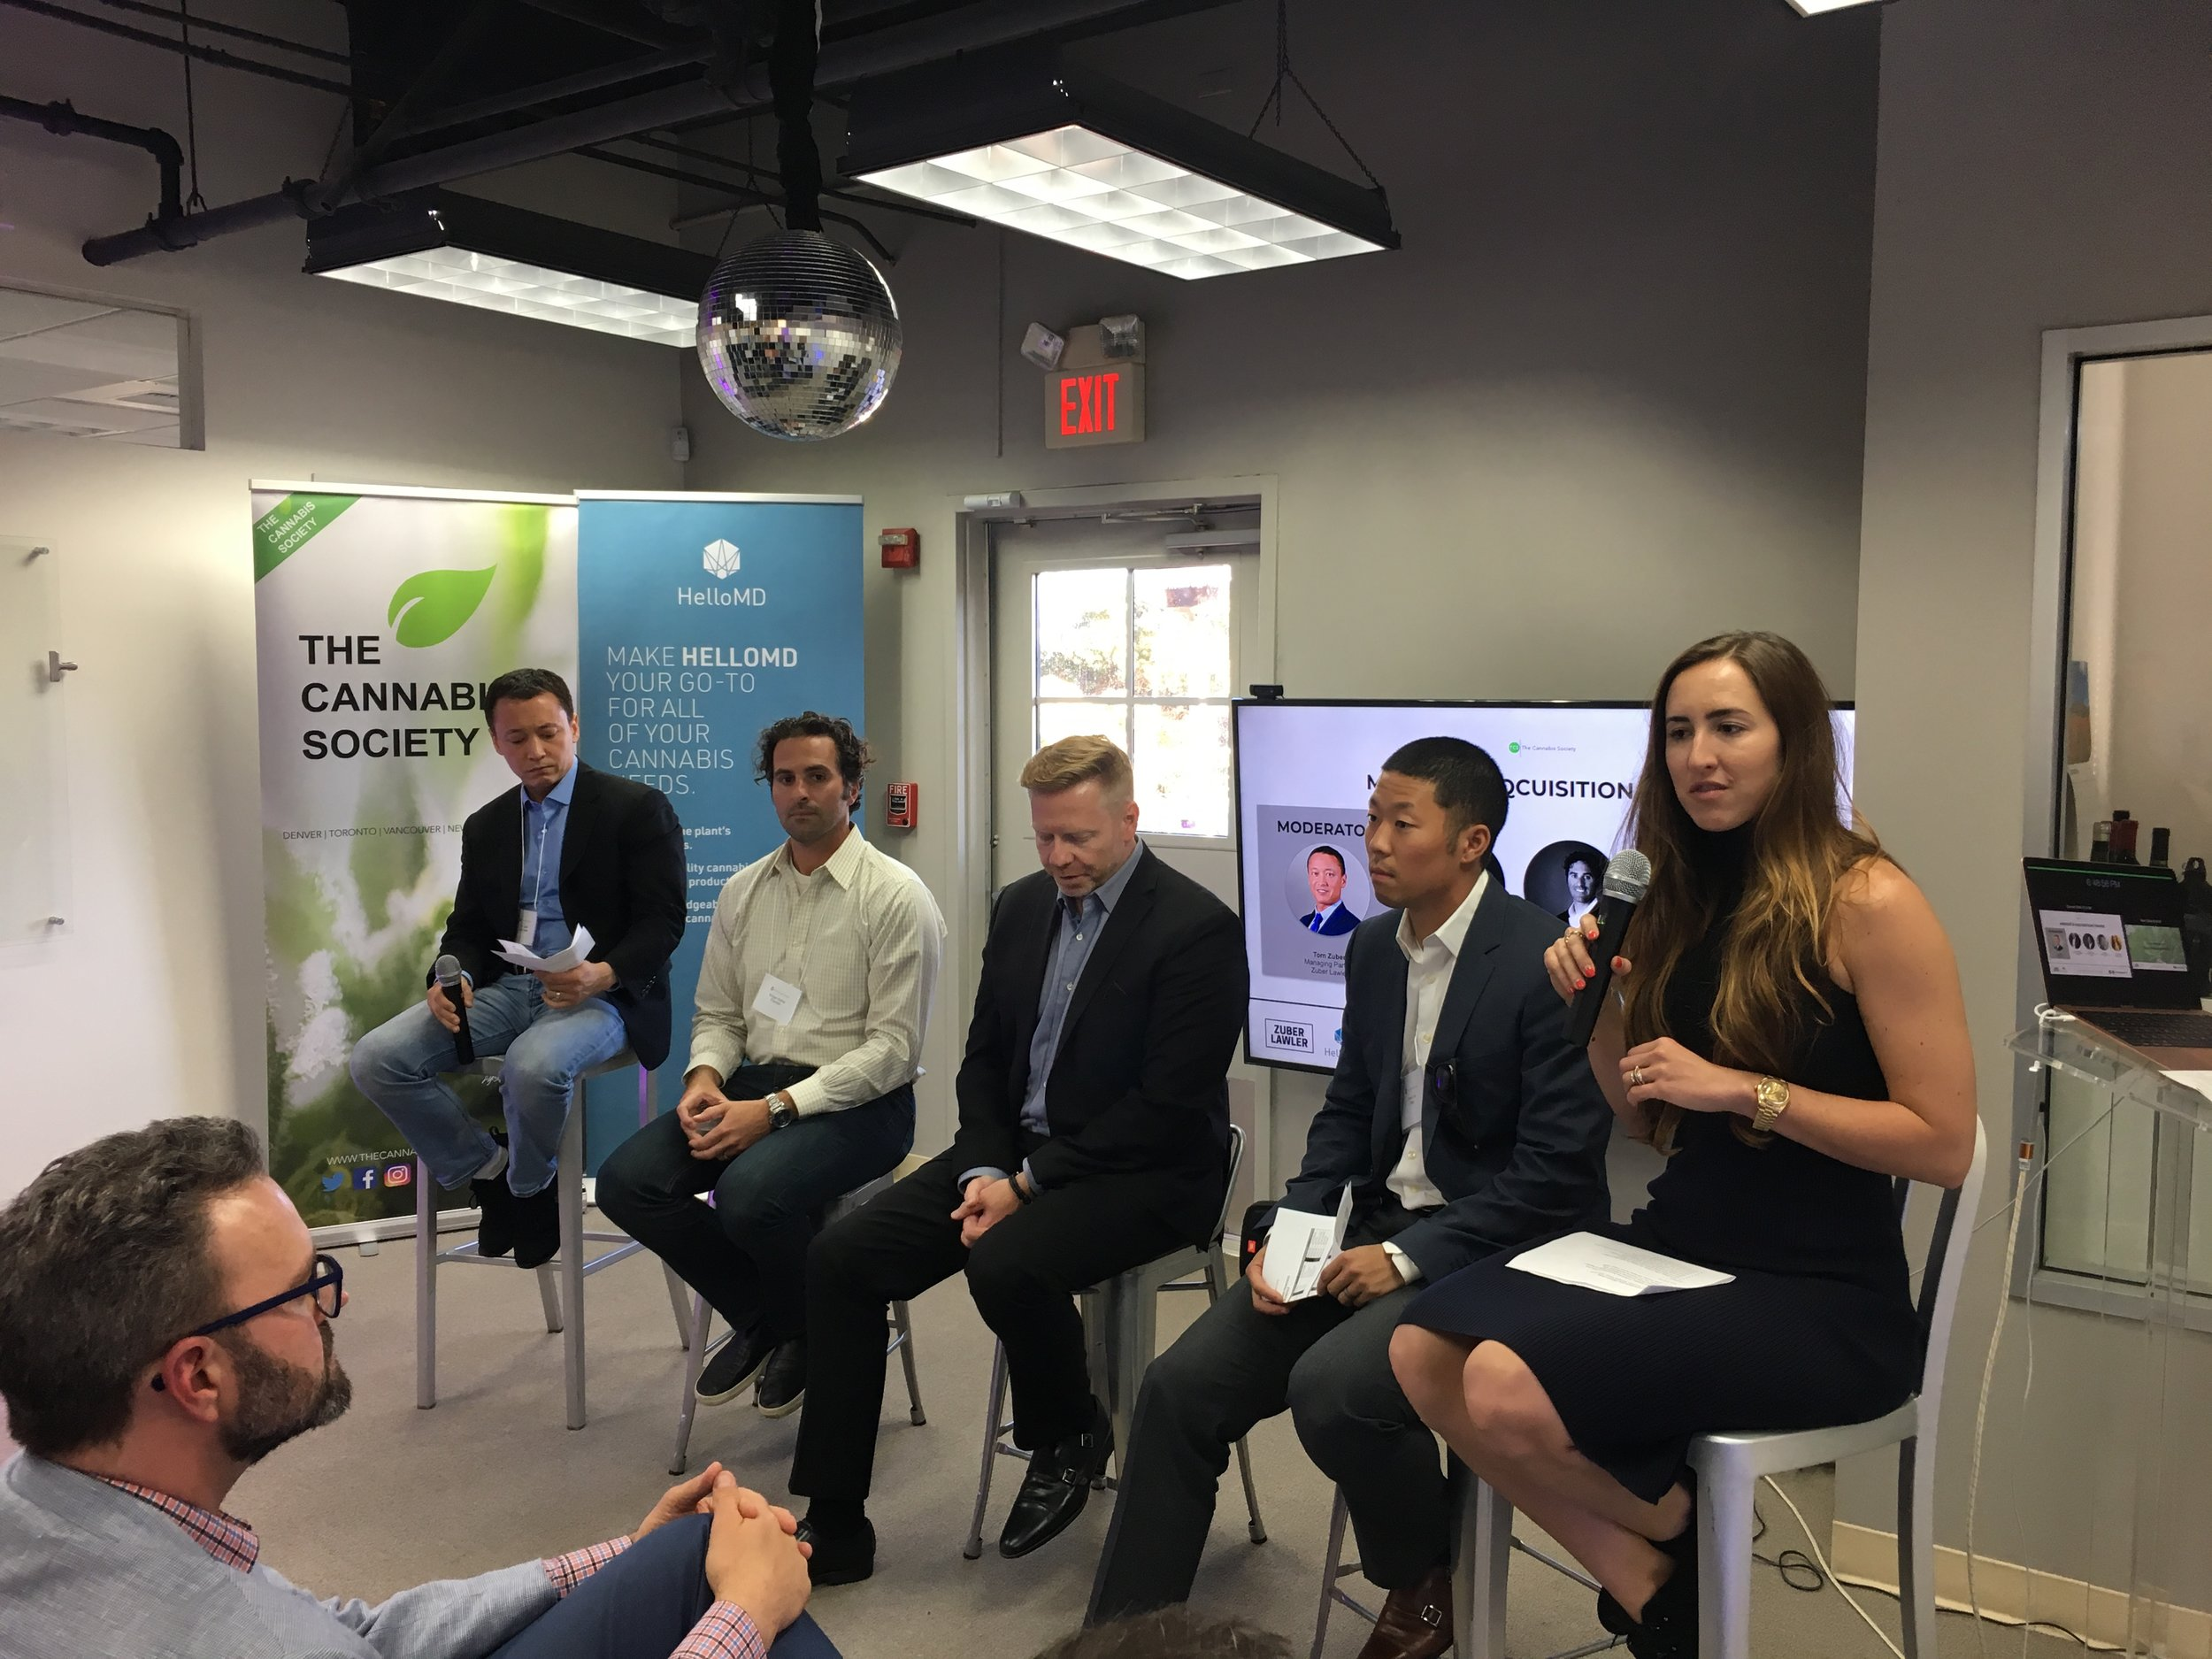 From left to right: Tom Zuber, Morgan Paxhia, Michael Litchfield, Steven Yoo, Codie Sanchez